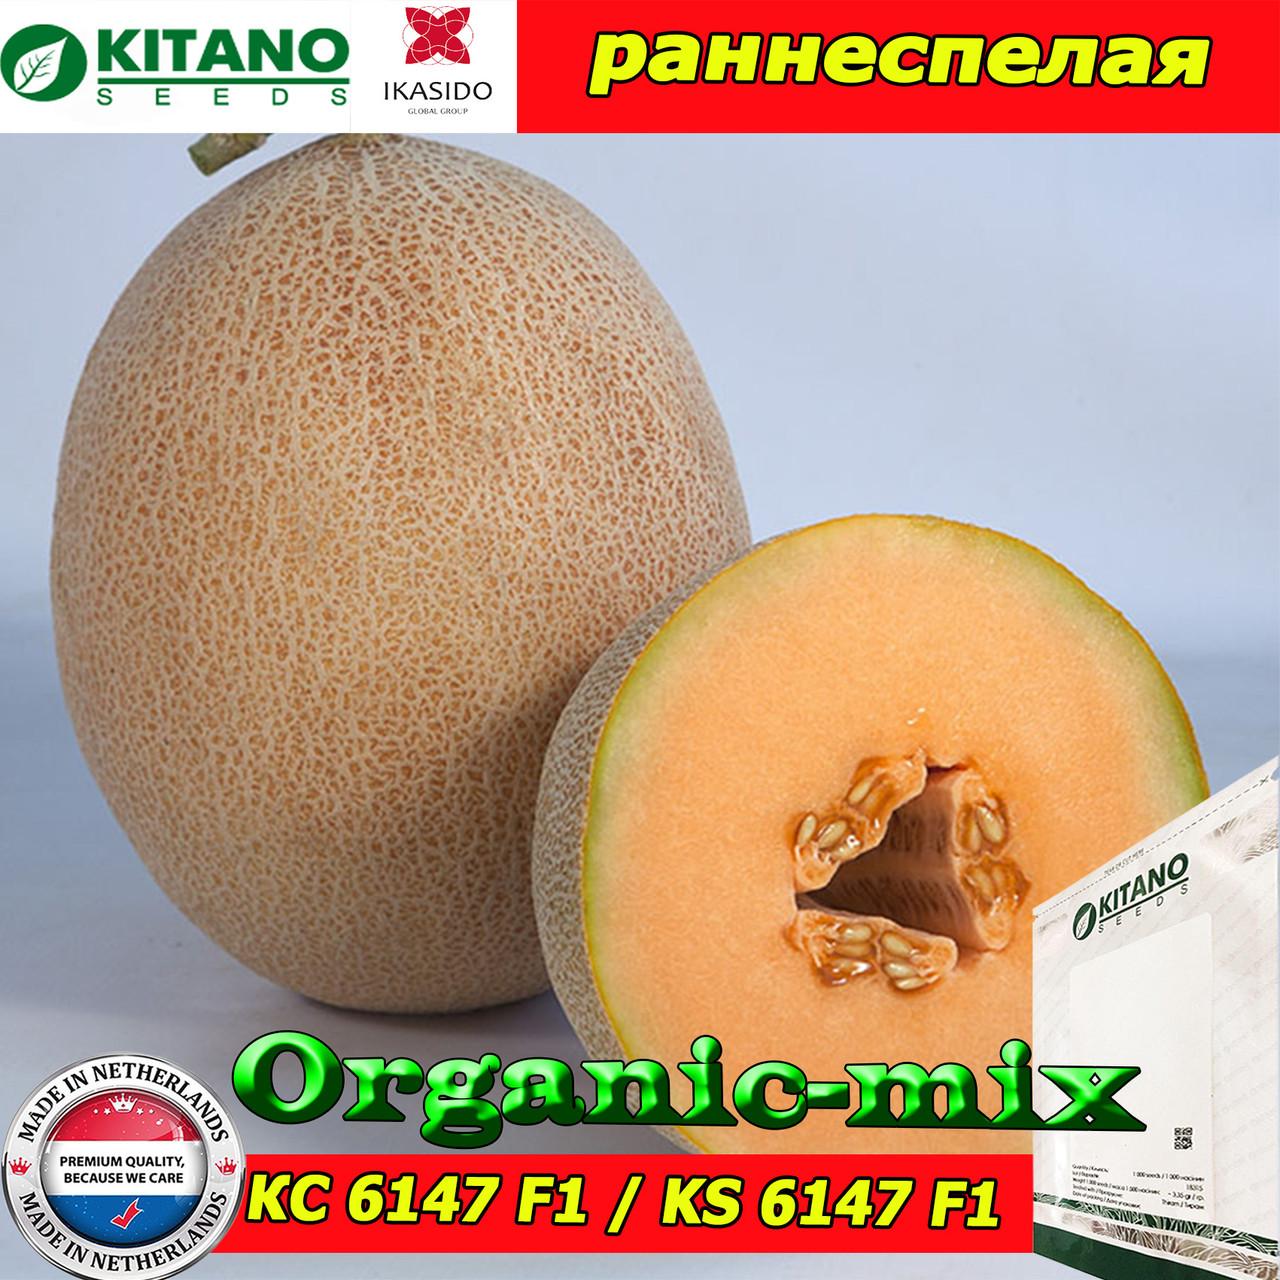 Семена, дыня КС 6147 F1 / KS 6147 F1 (ранеспелая), 100 семян ТМ Kitano Seeds (Нидерланды)